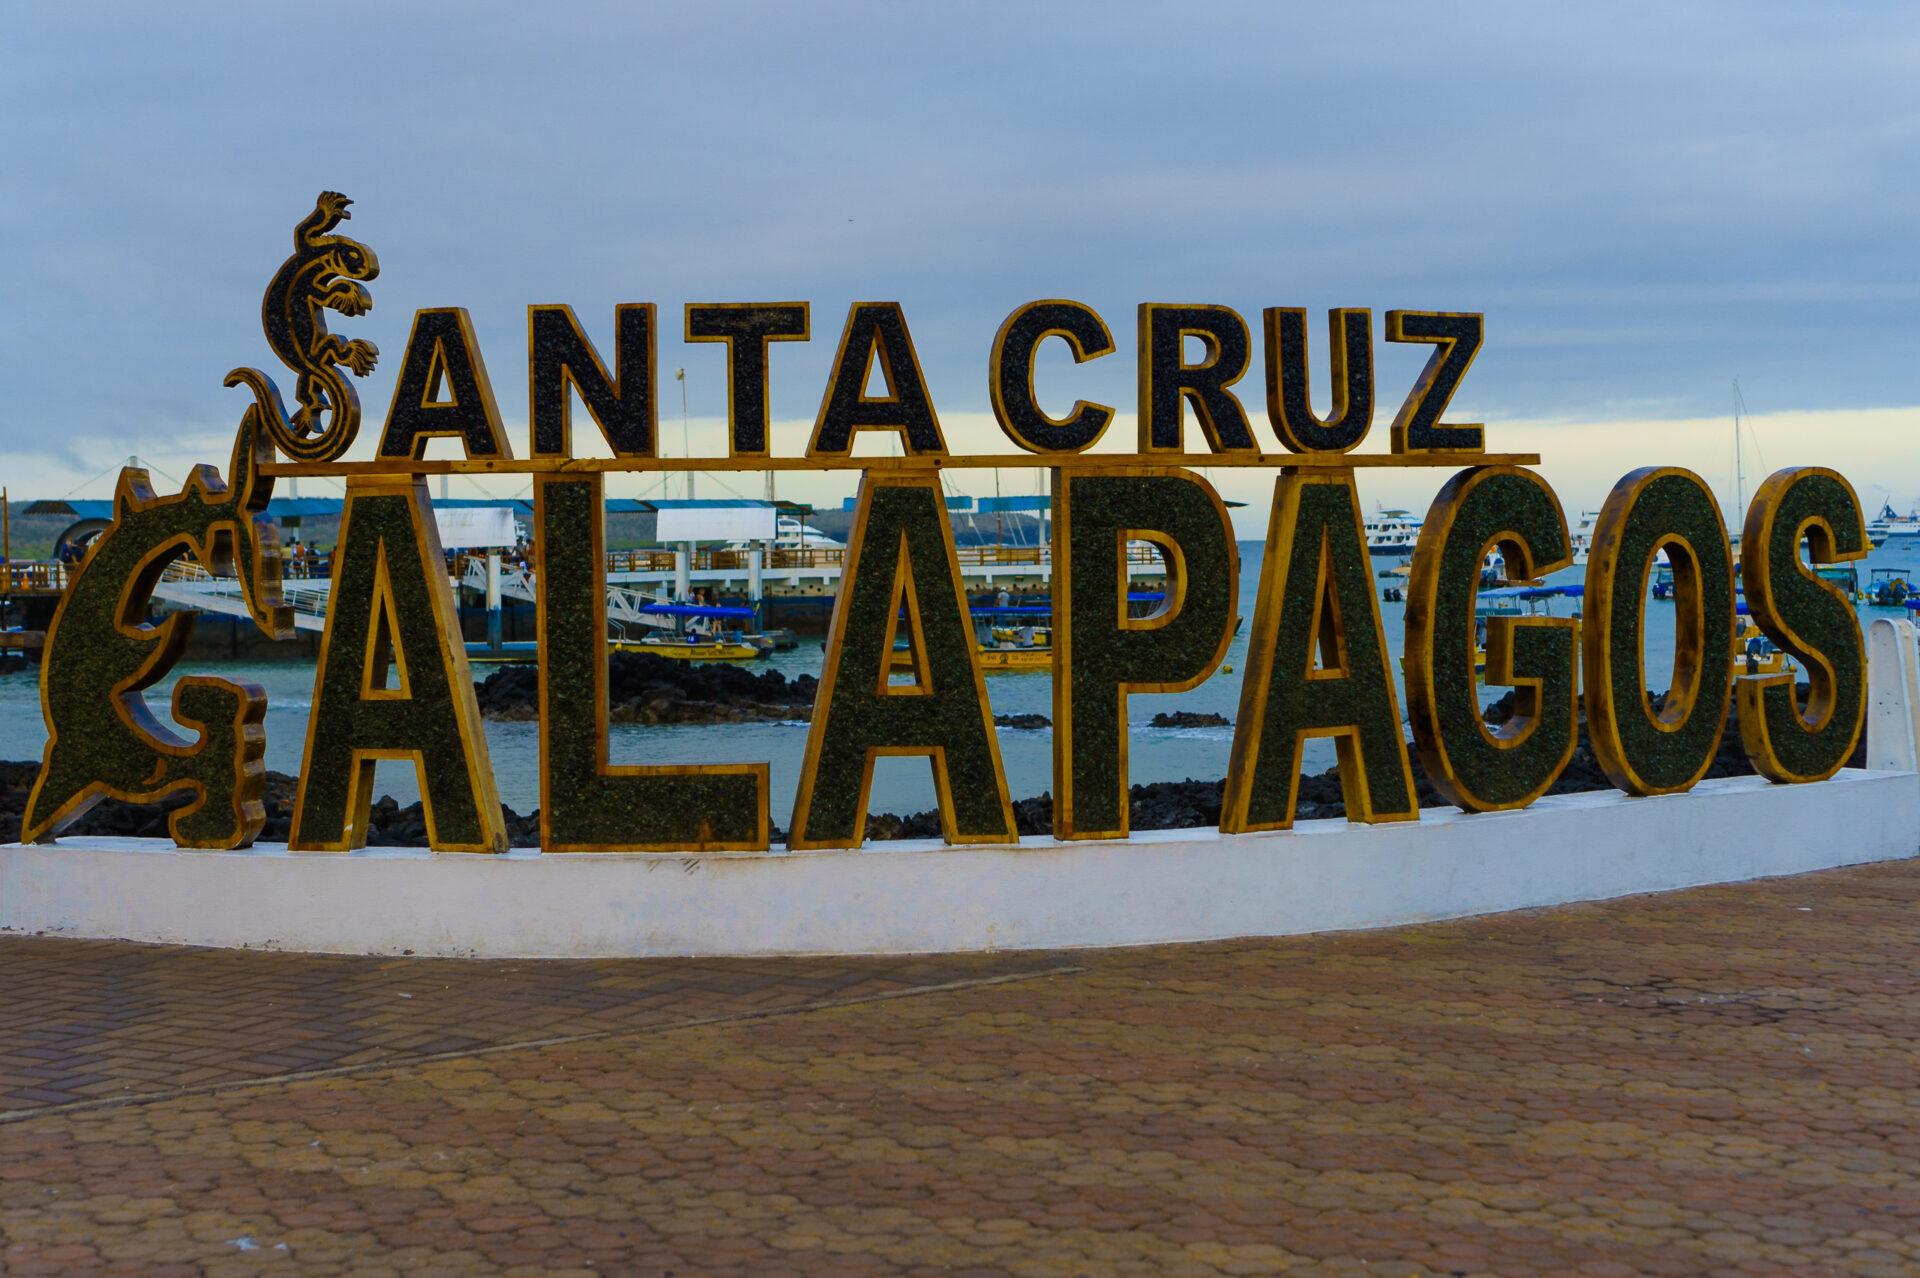 Santa Cruz Galapagos Islands Couchsurfing Sustainable Tourism